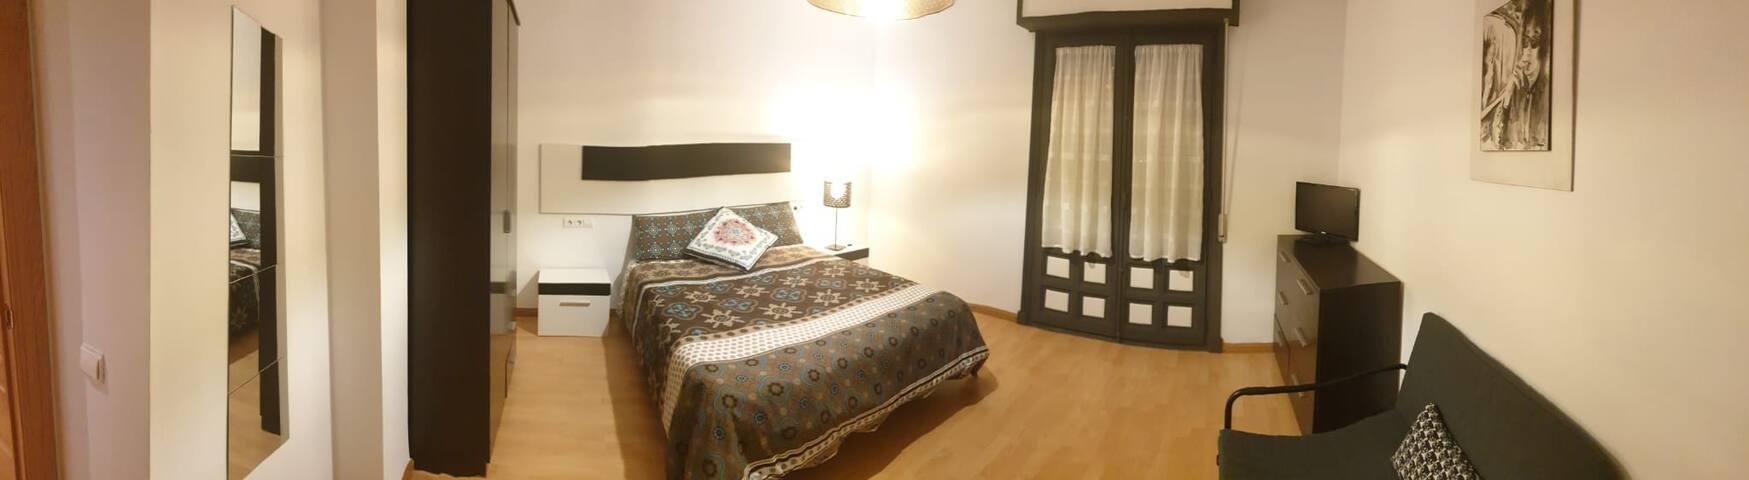 Habitación BOB DYLAN para 1 o 2 personas